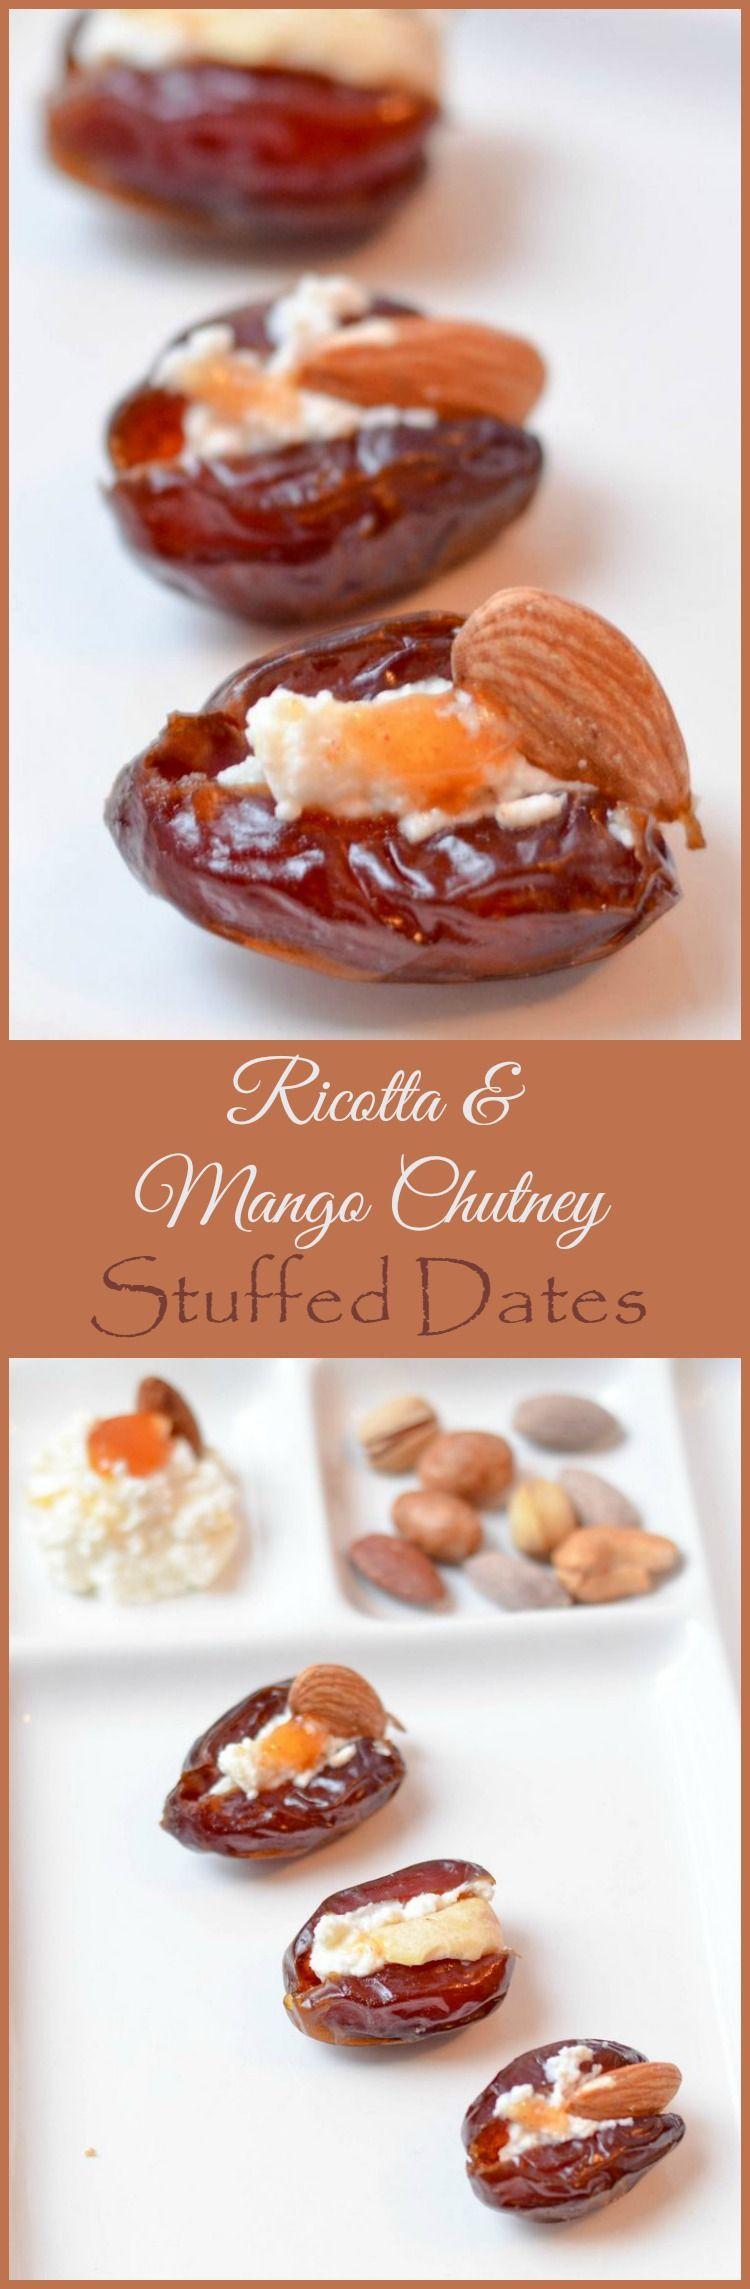 Ricotta & Mango Chutney Stuffed Dates Holiday Appetizer Recipe #TheCulturedKitchen